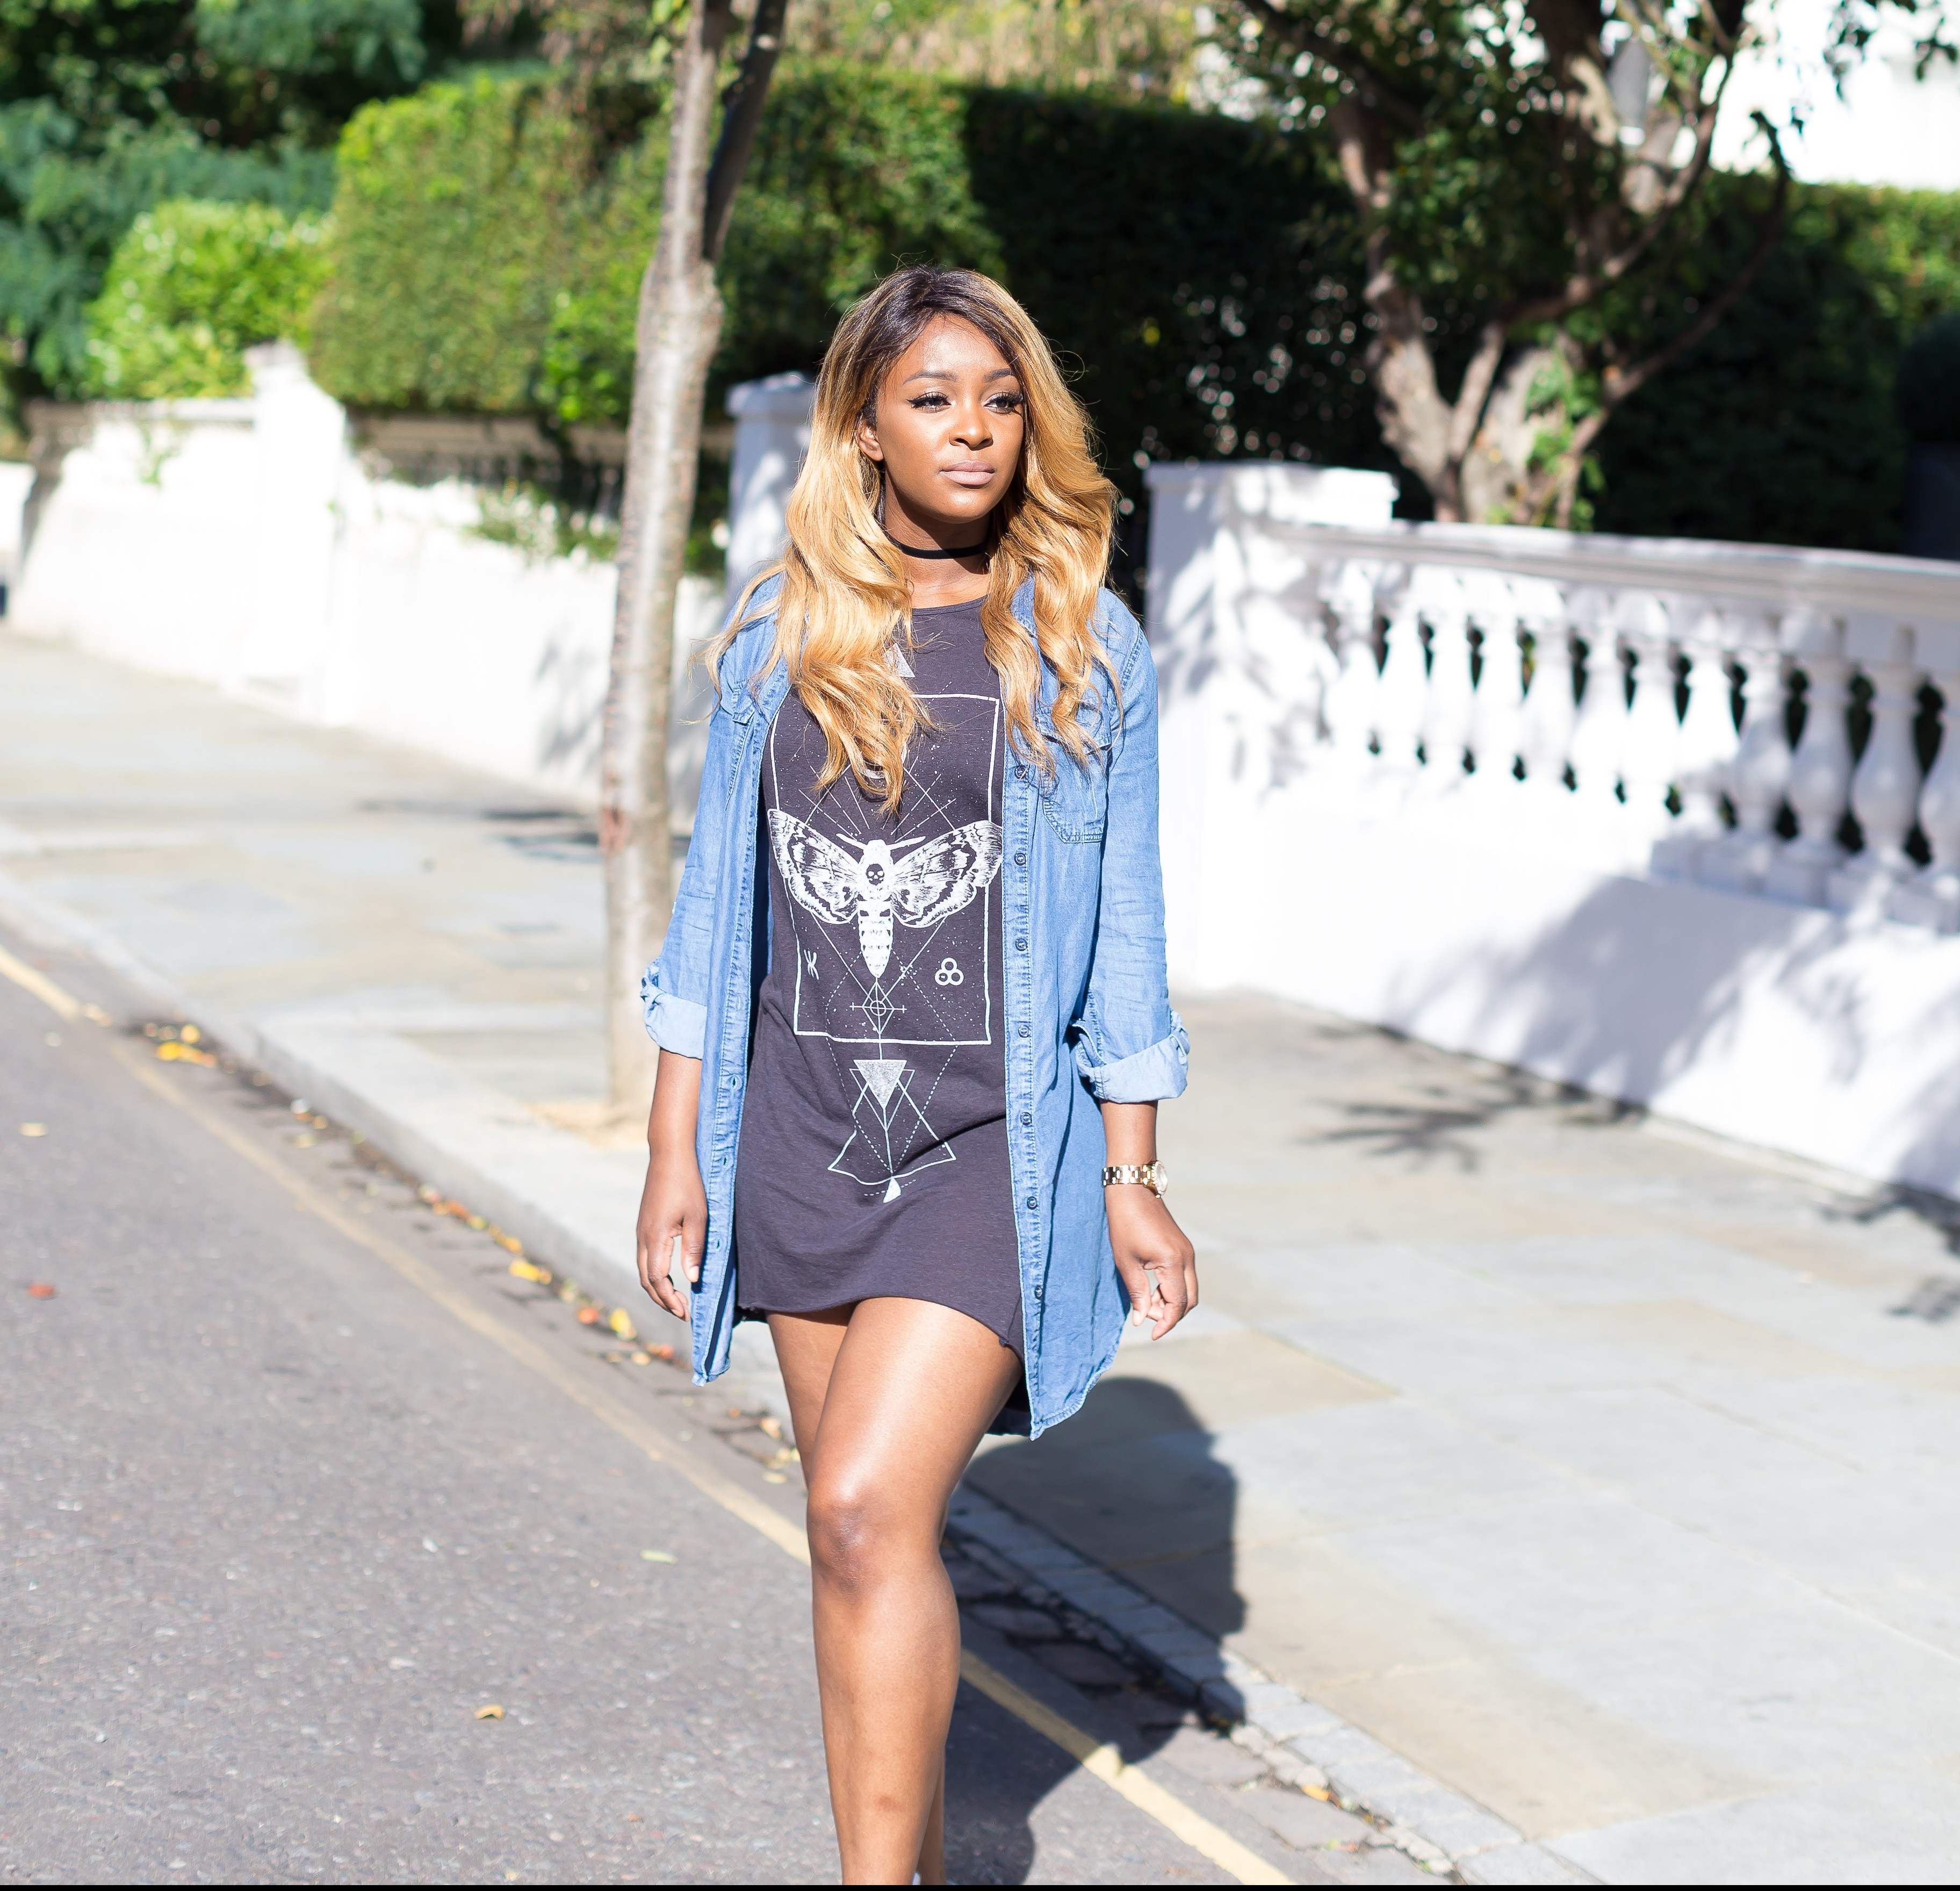 raychel-says-blue-denim-dress-brown-print-top-micheal-kors-rose-gold-watch-adidas-superstar-black-choker